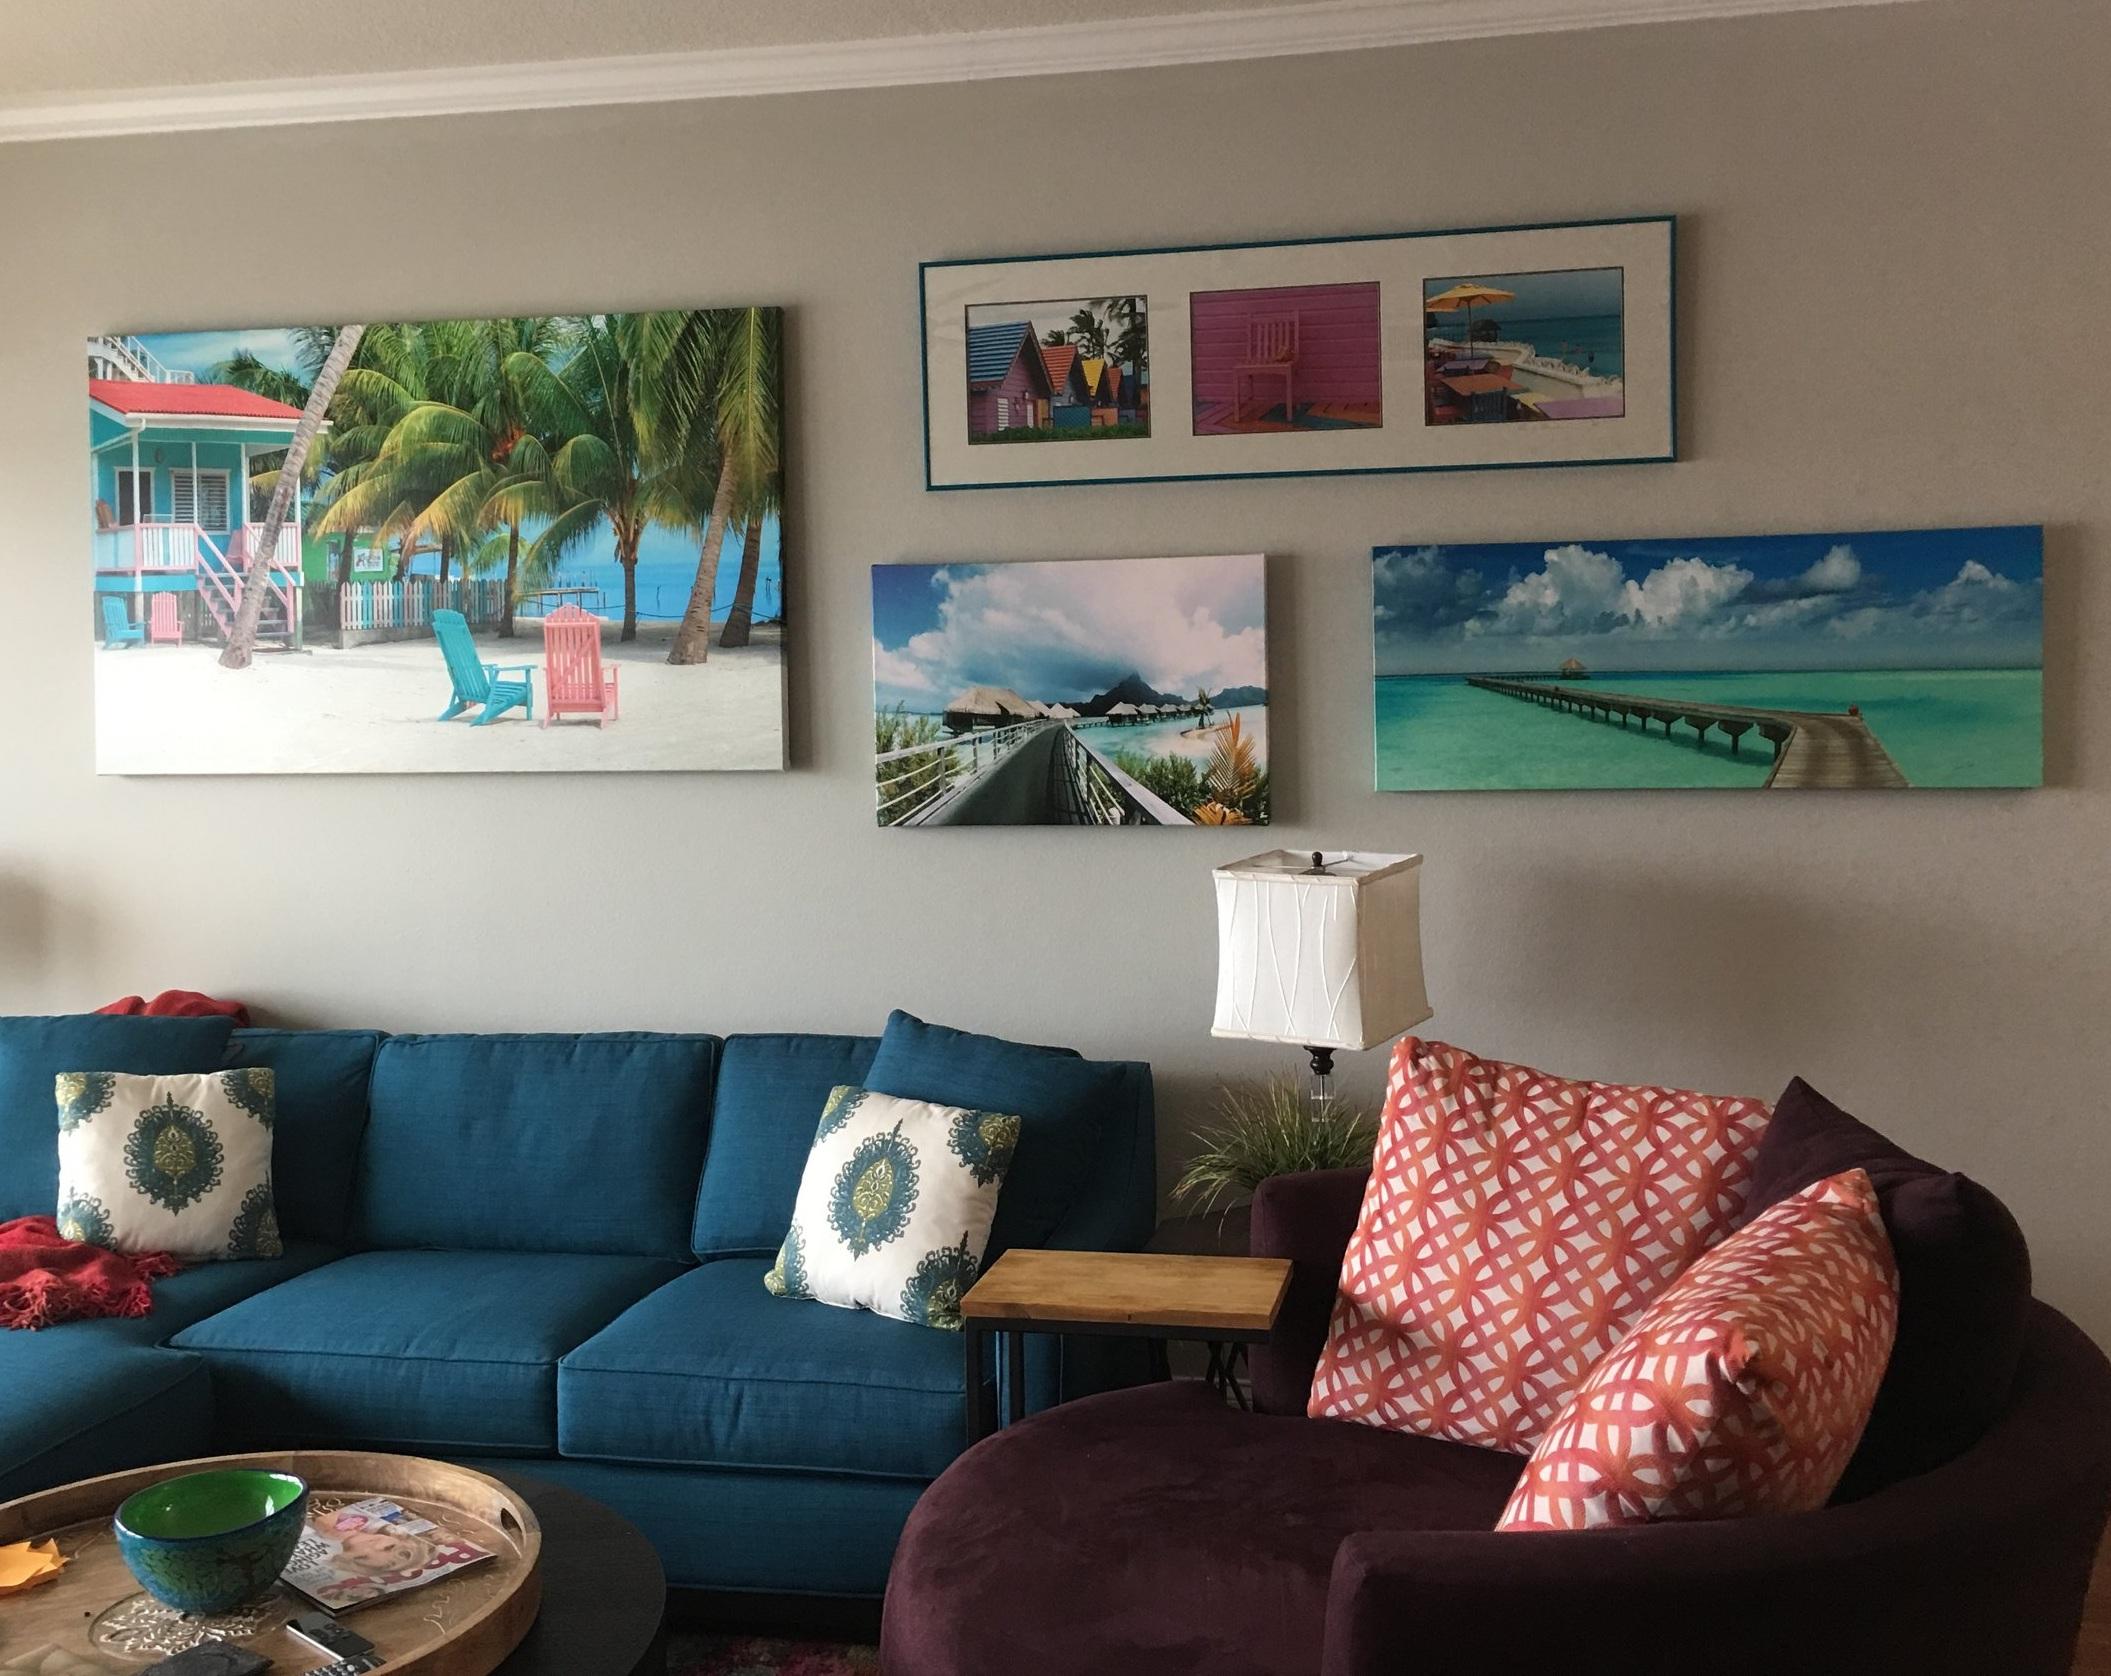 colorful living room accessorizing art work custom pillows